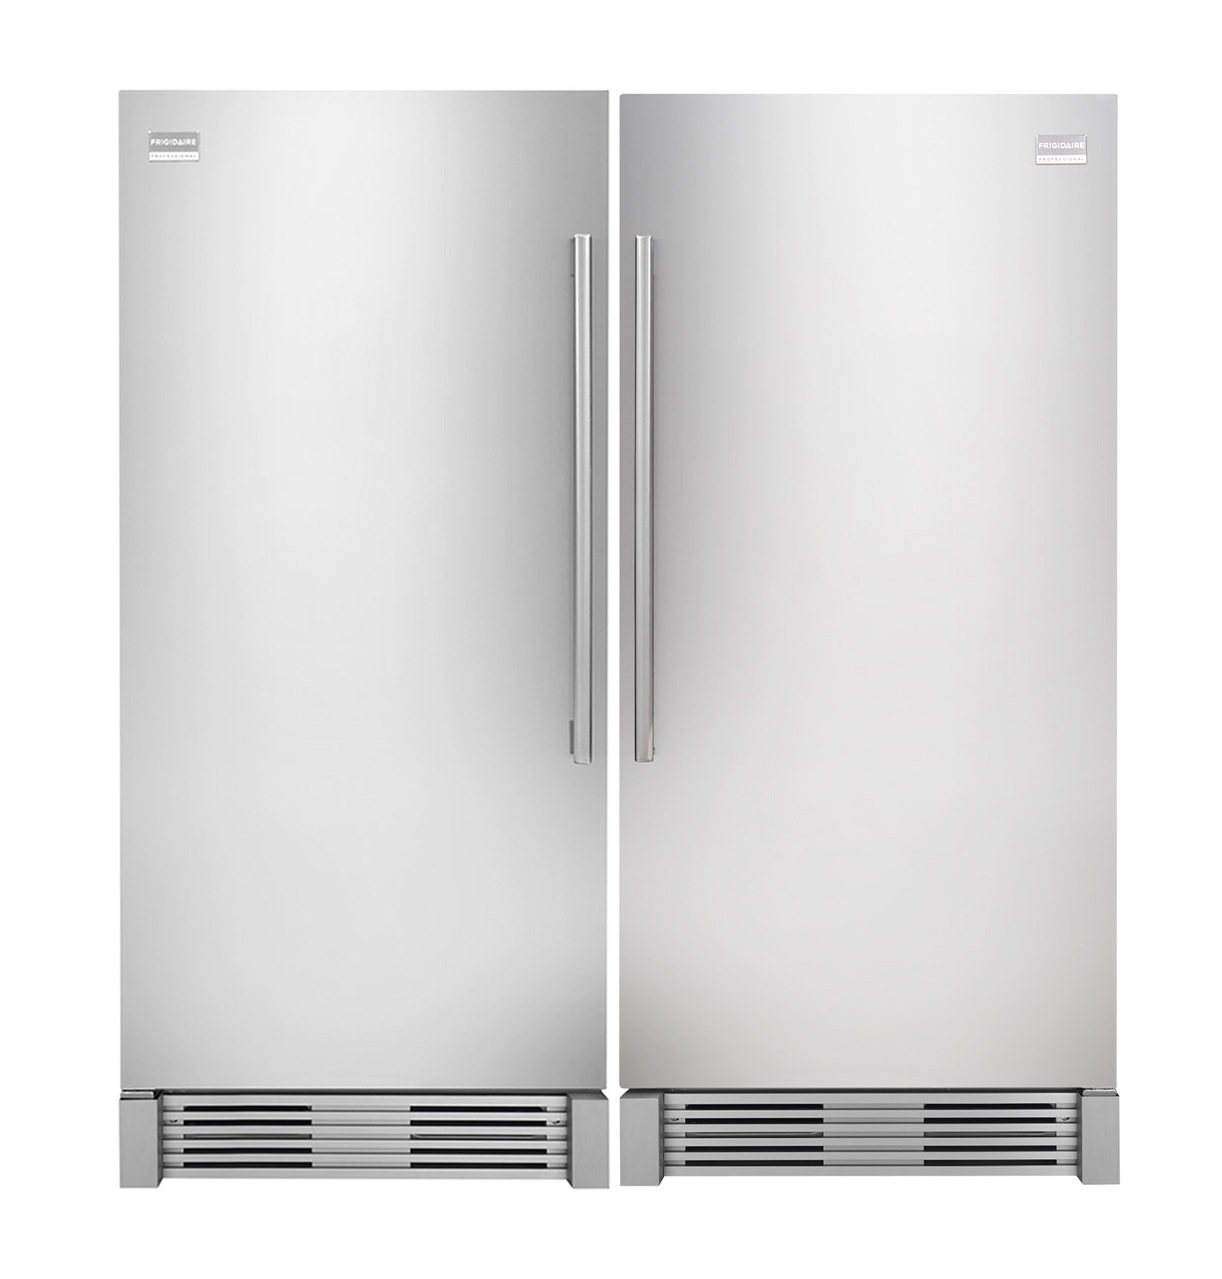 Frigidaire Professional Stainless Steel Refrigerator